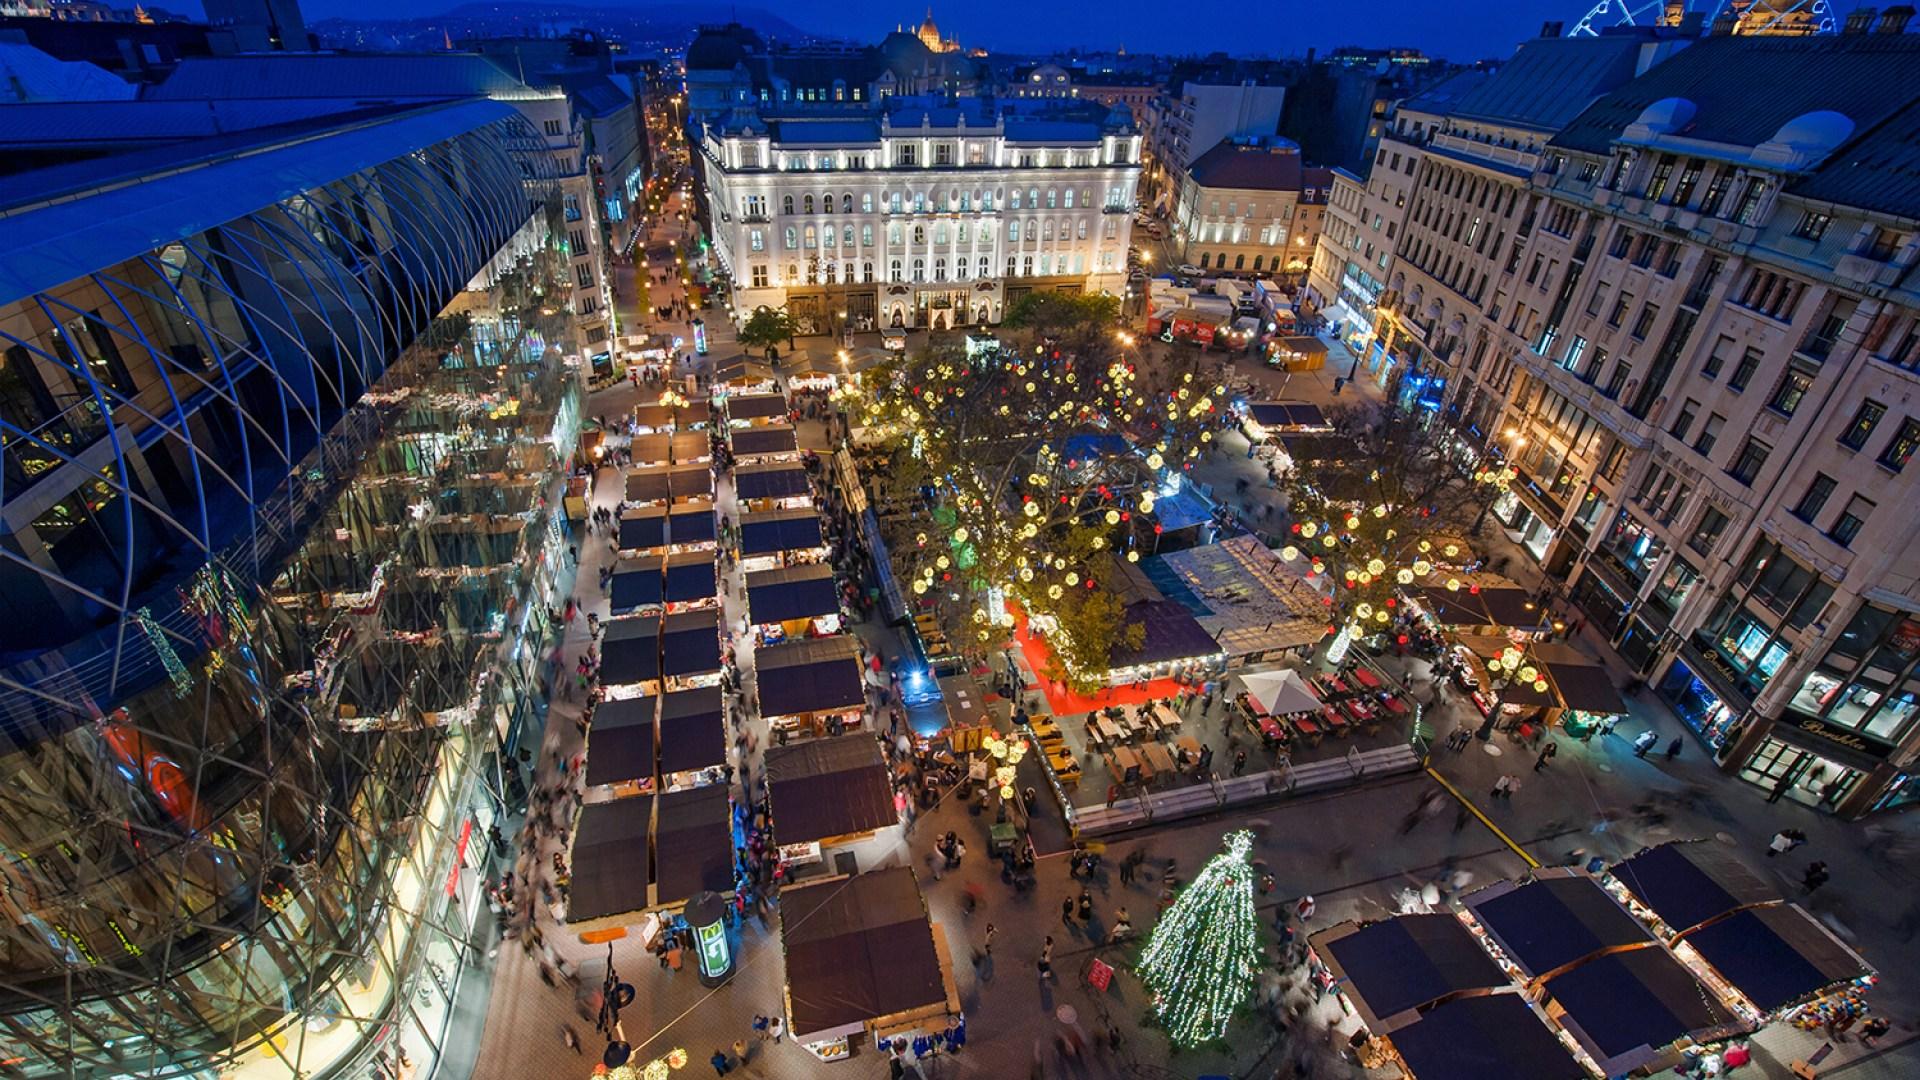 Vorosmarty Square Budapest Christmas Market.The Magazine Hotel Shortlist Best Programs In December